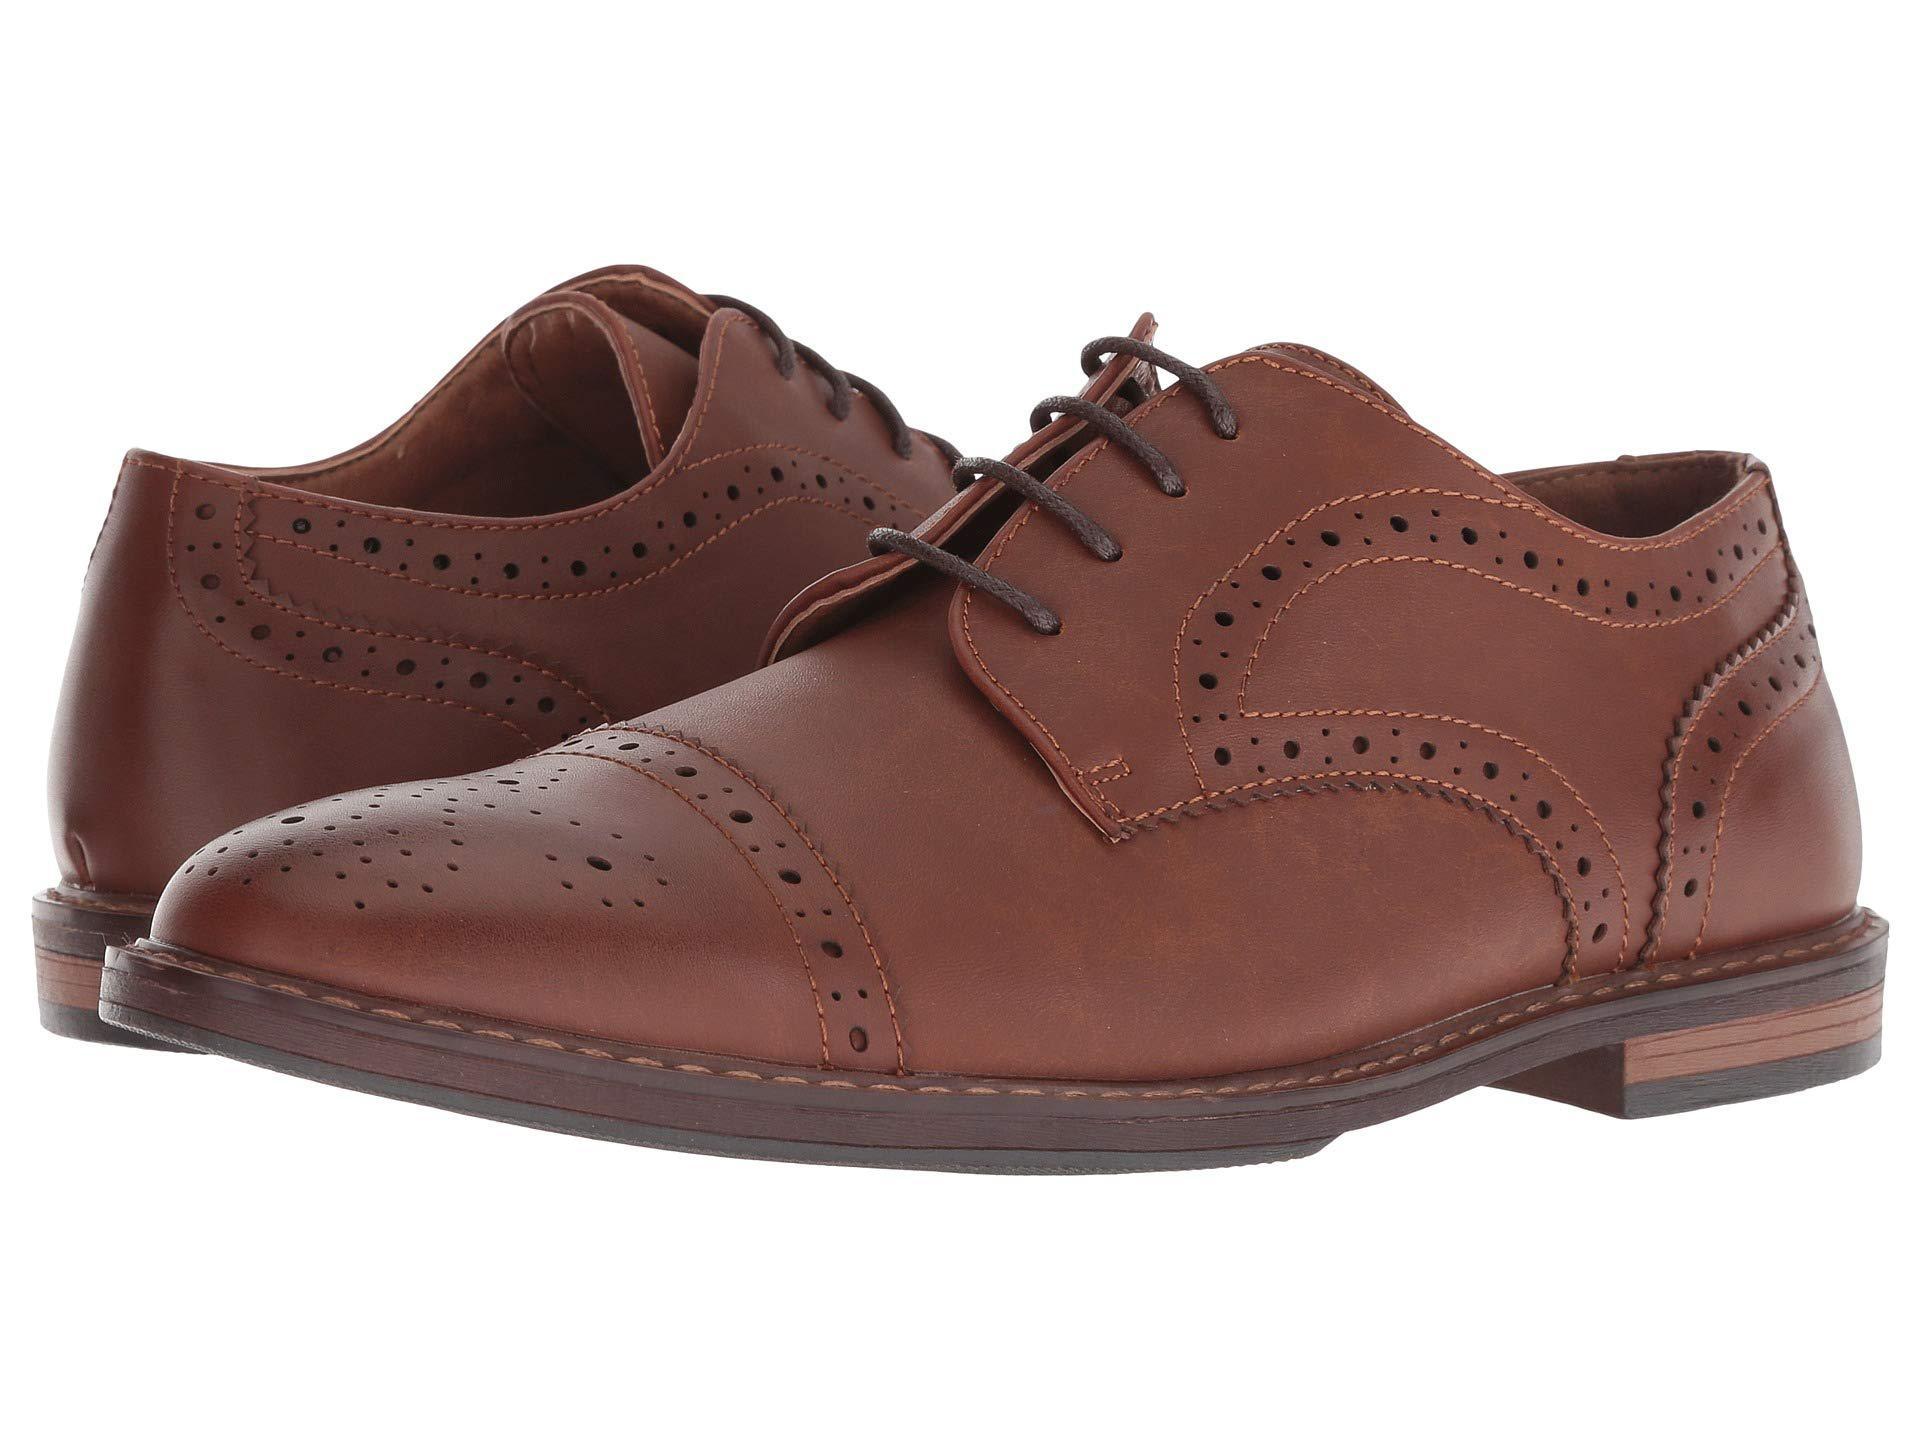 5186f8e5fe Lyst - Nunn Bush Palmer Cap Toe Oxford (cognac) Men s Shoes in Brown ...